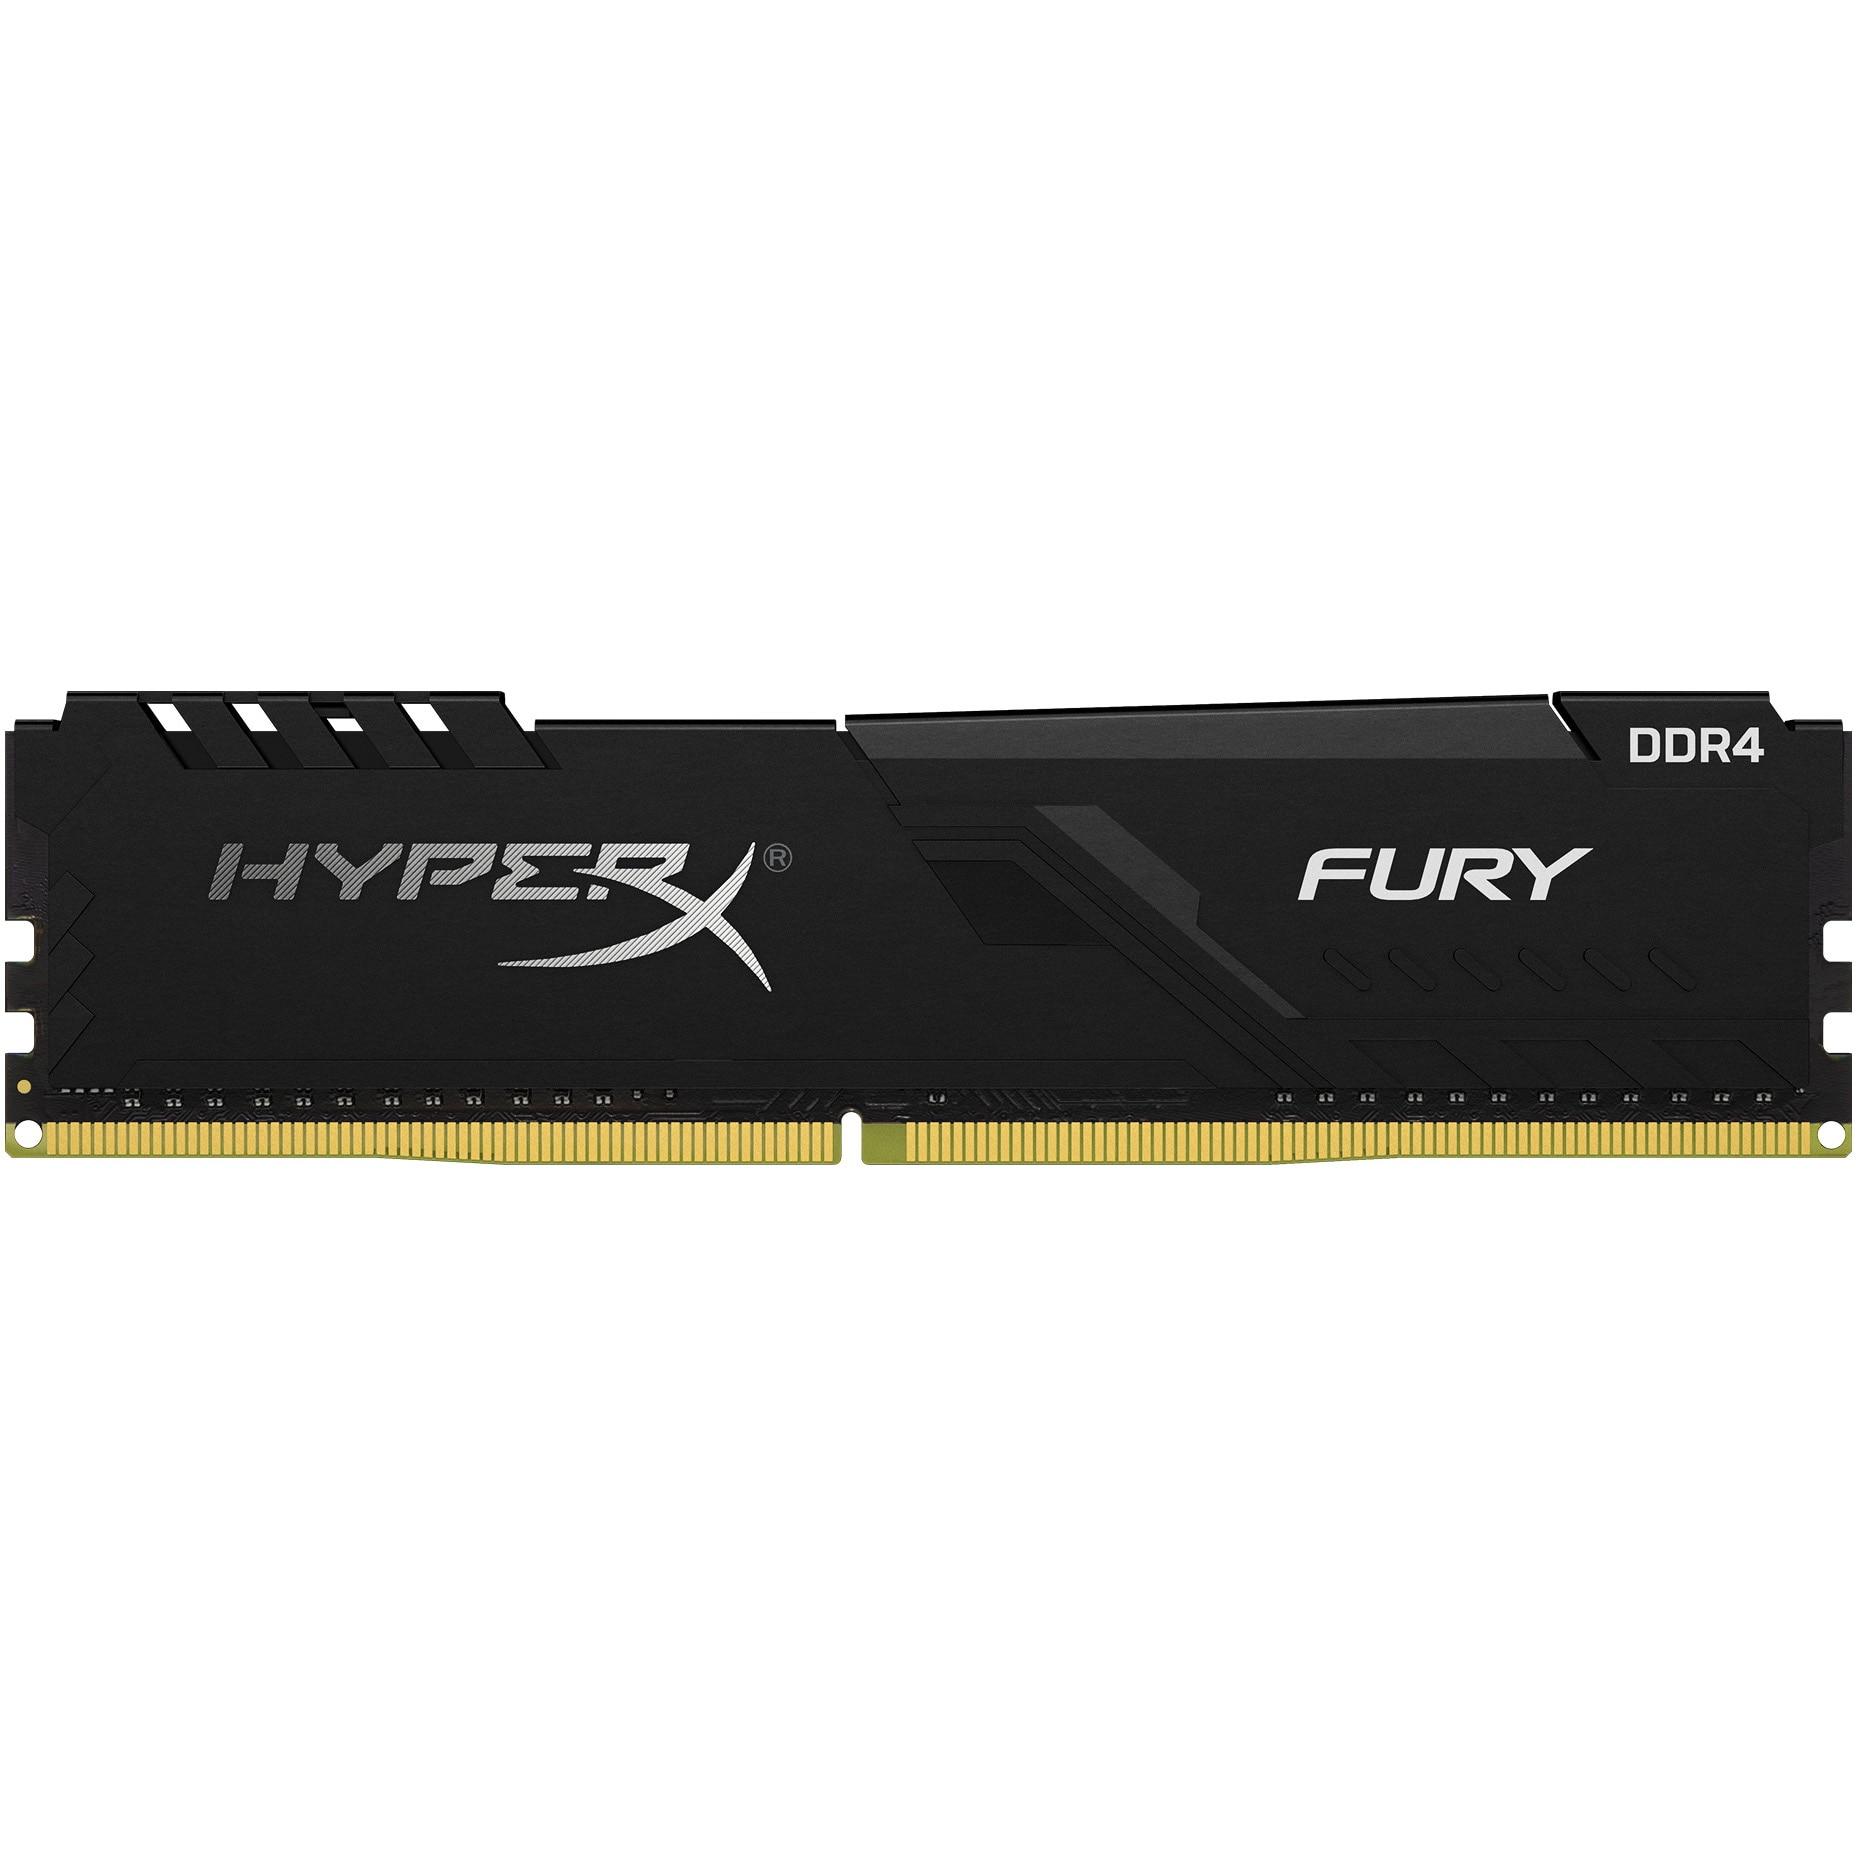 Fotografie Memorie HyperX Fury, 16GB DDR4, 2666MHz CL16